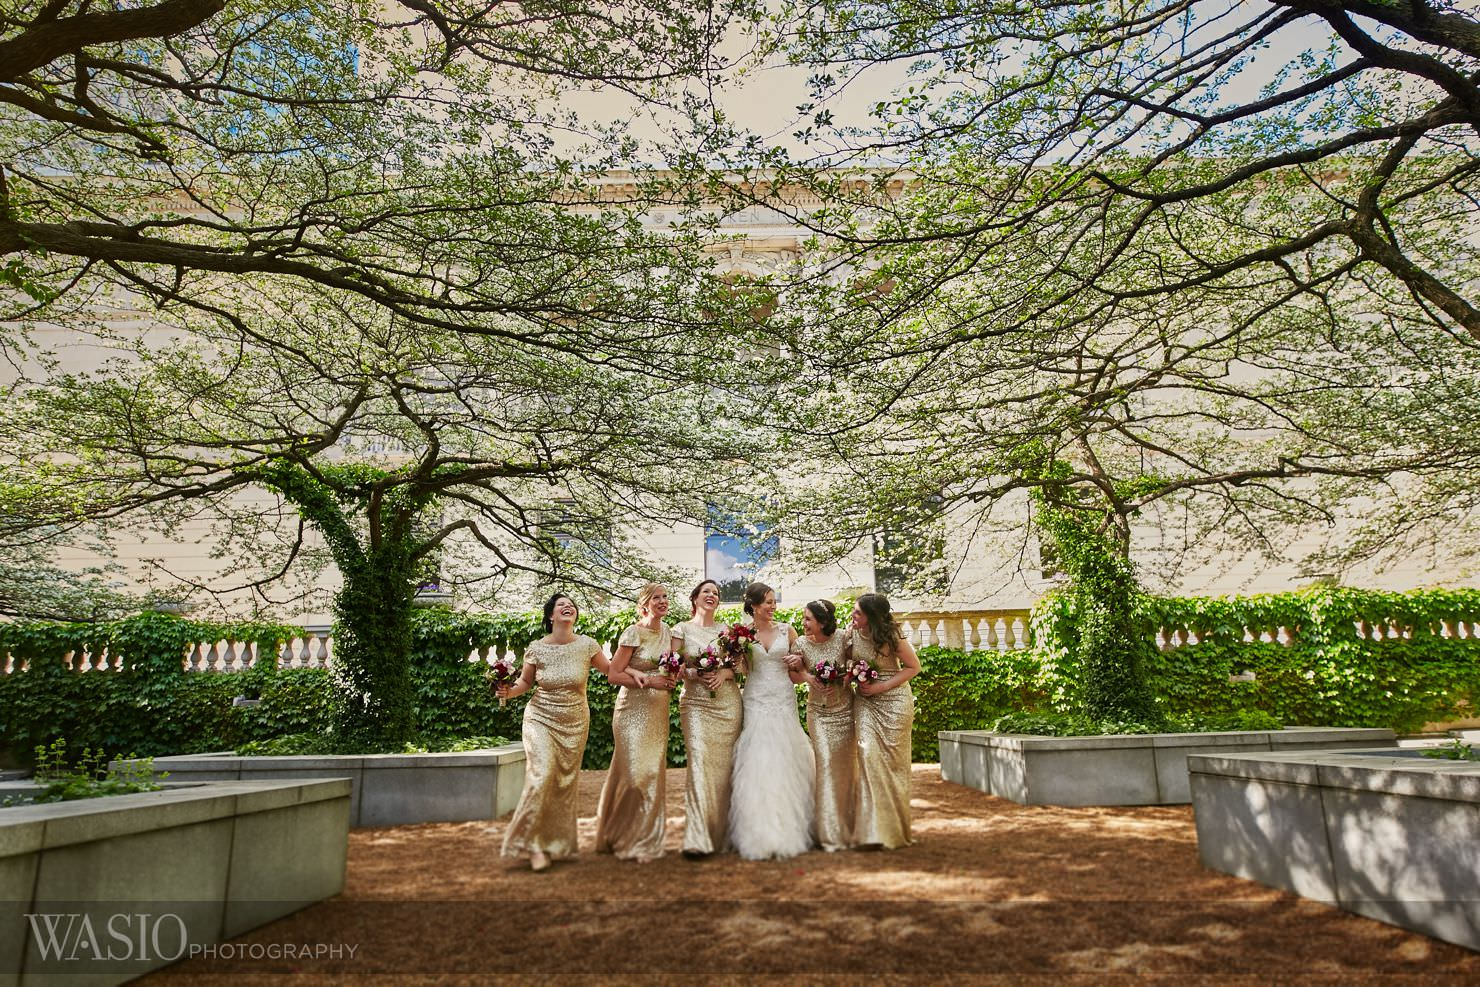 020_Lincoln-Park-Wedding_Dimphy-Mark__O3A9806 Lincoln Park Wedding - Dimphy & Mark